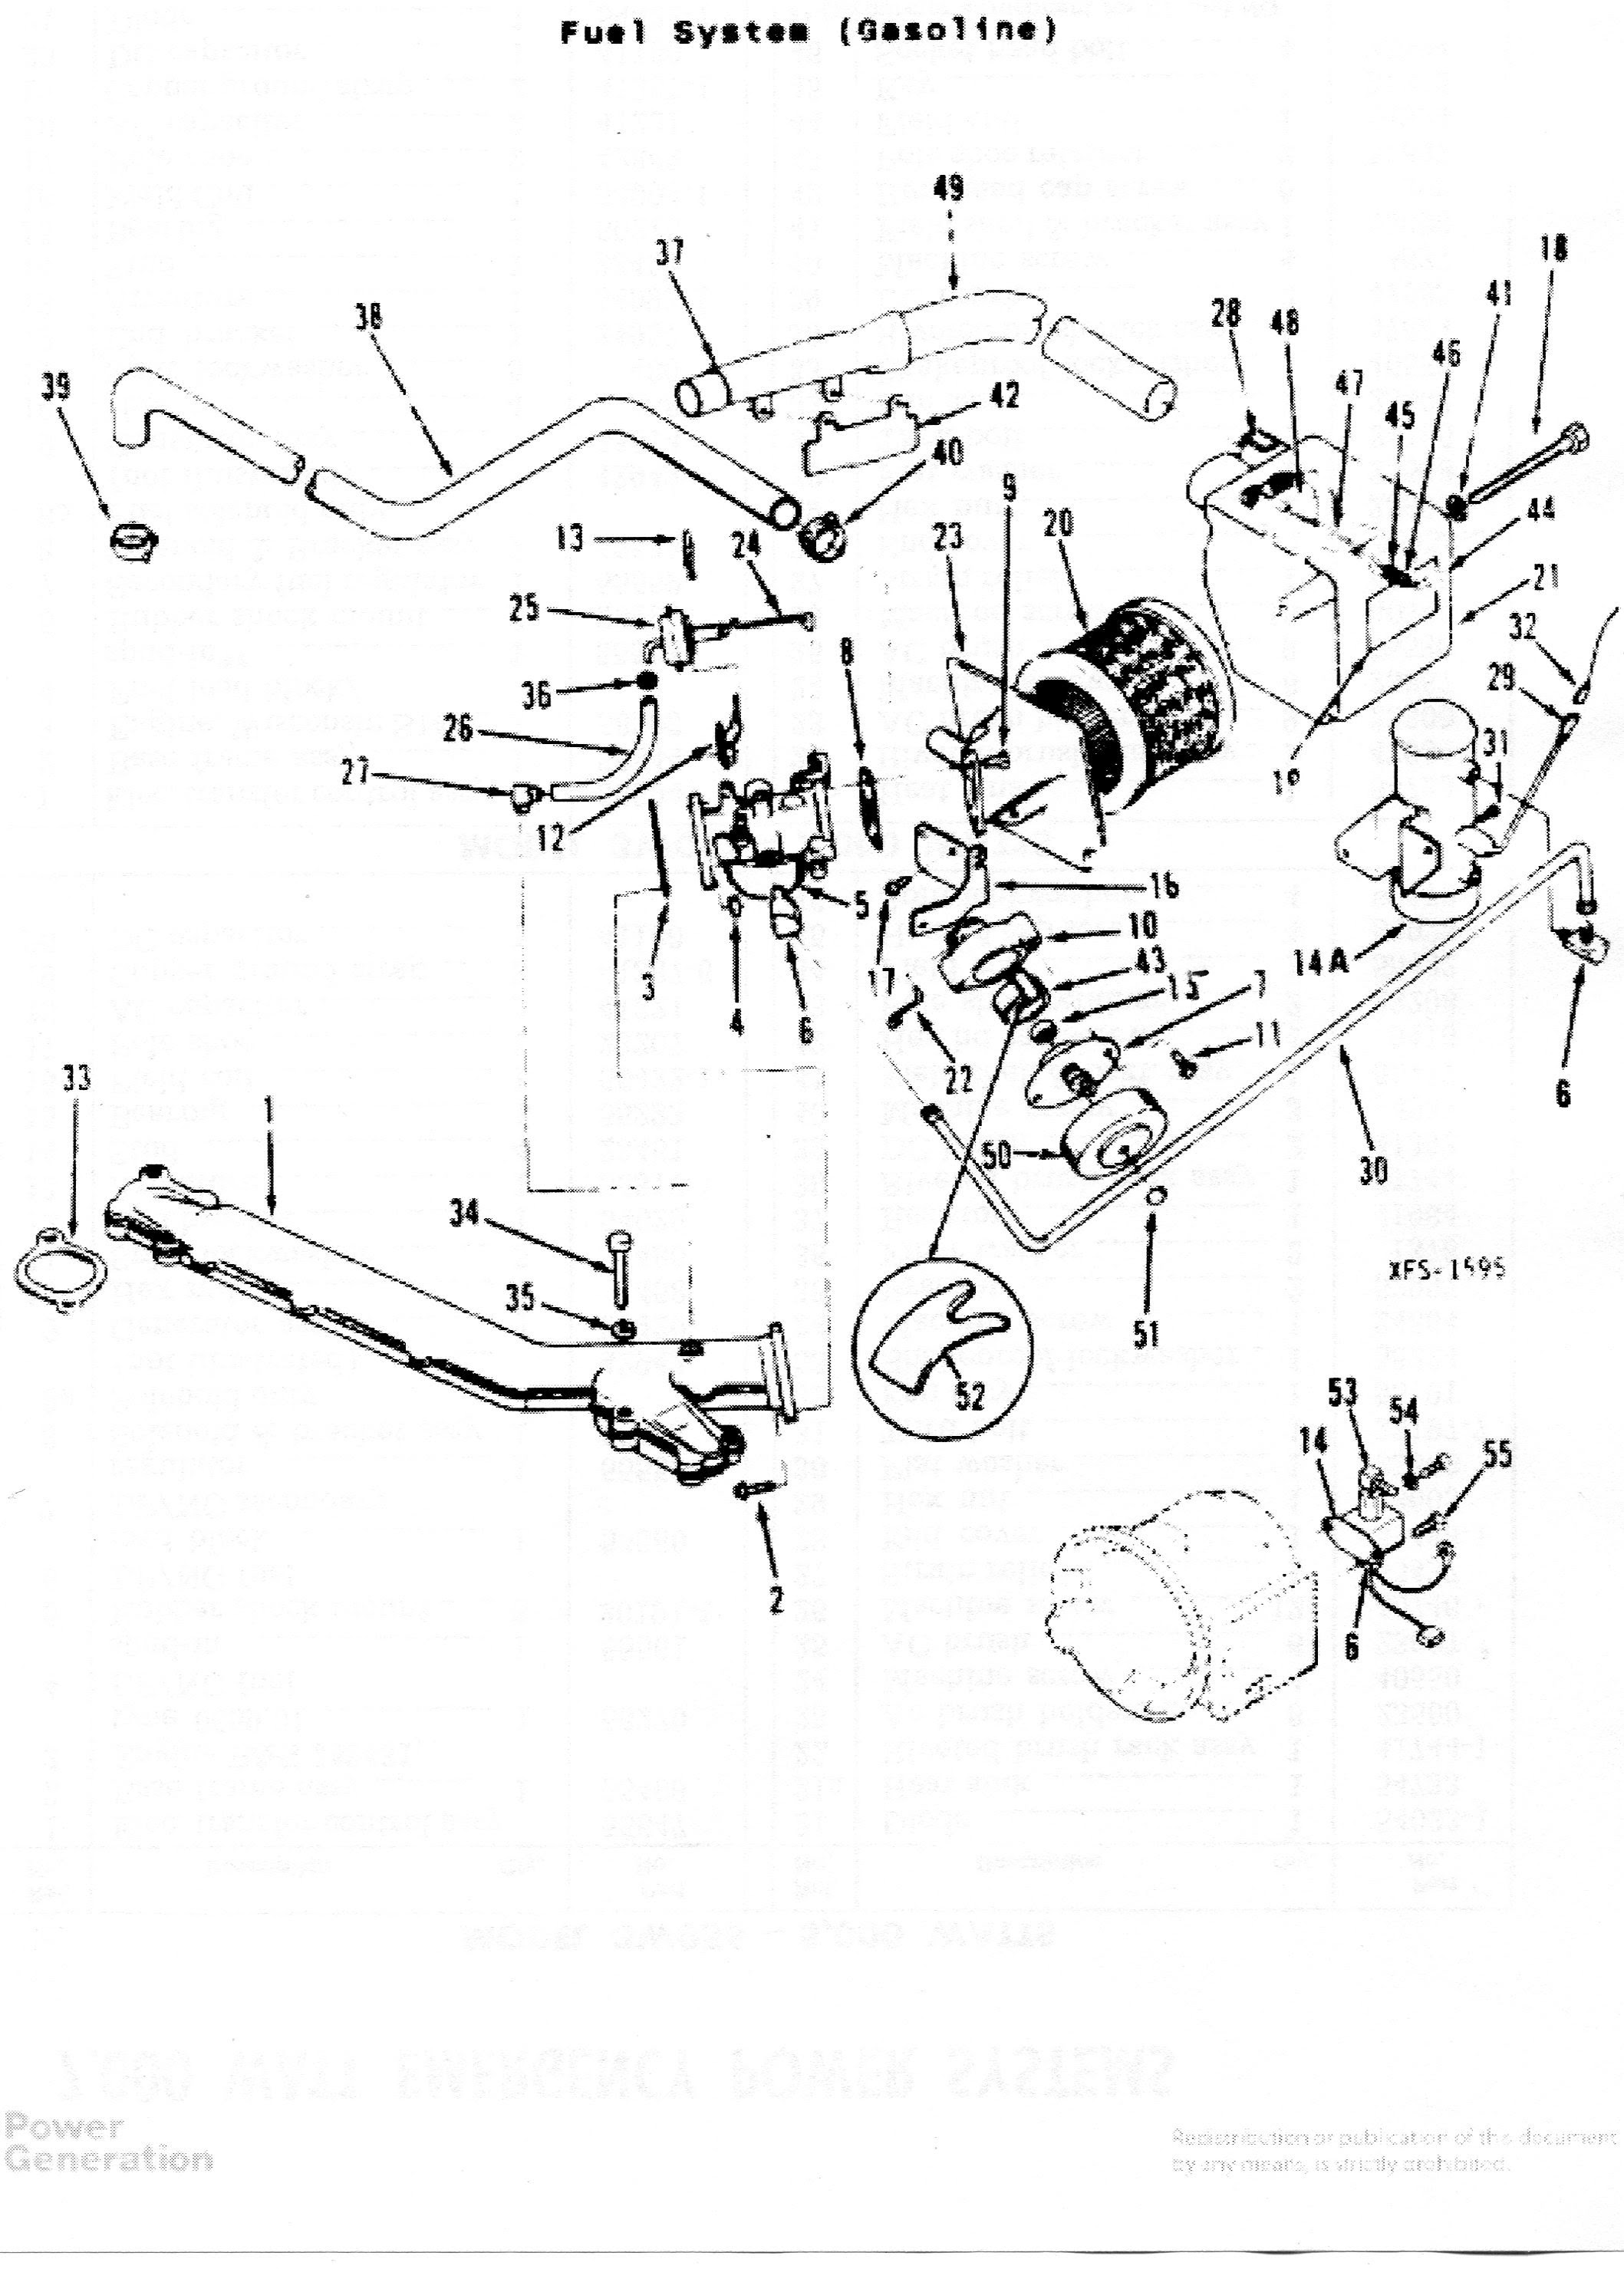 Onan 5500 Marquis Gold Generator Parts Diagram